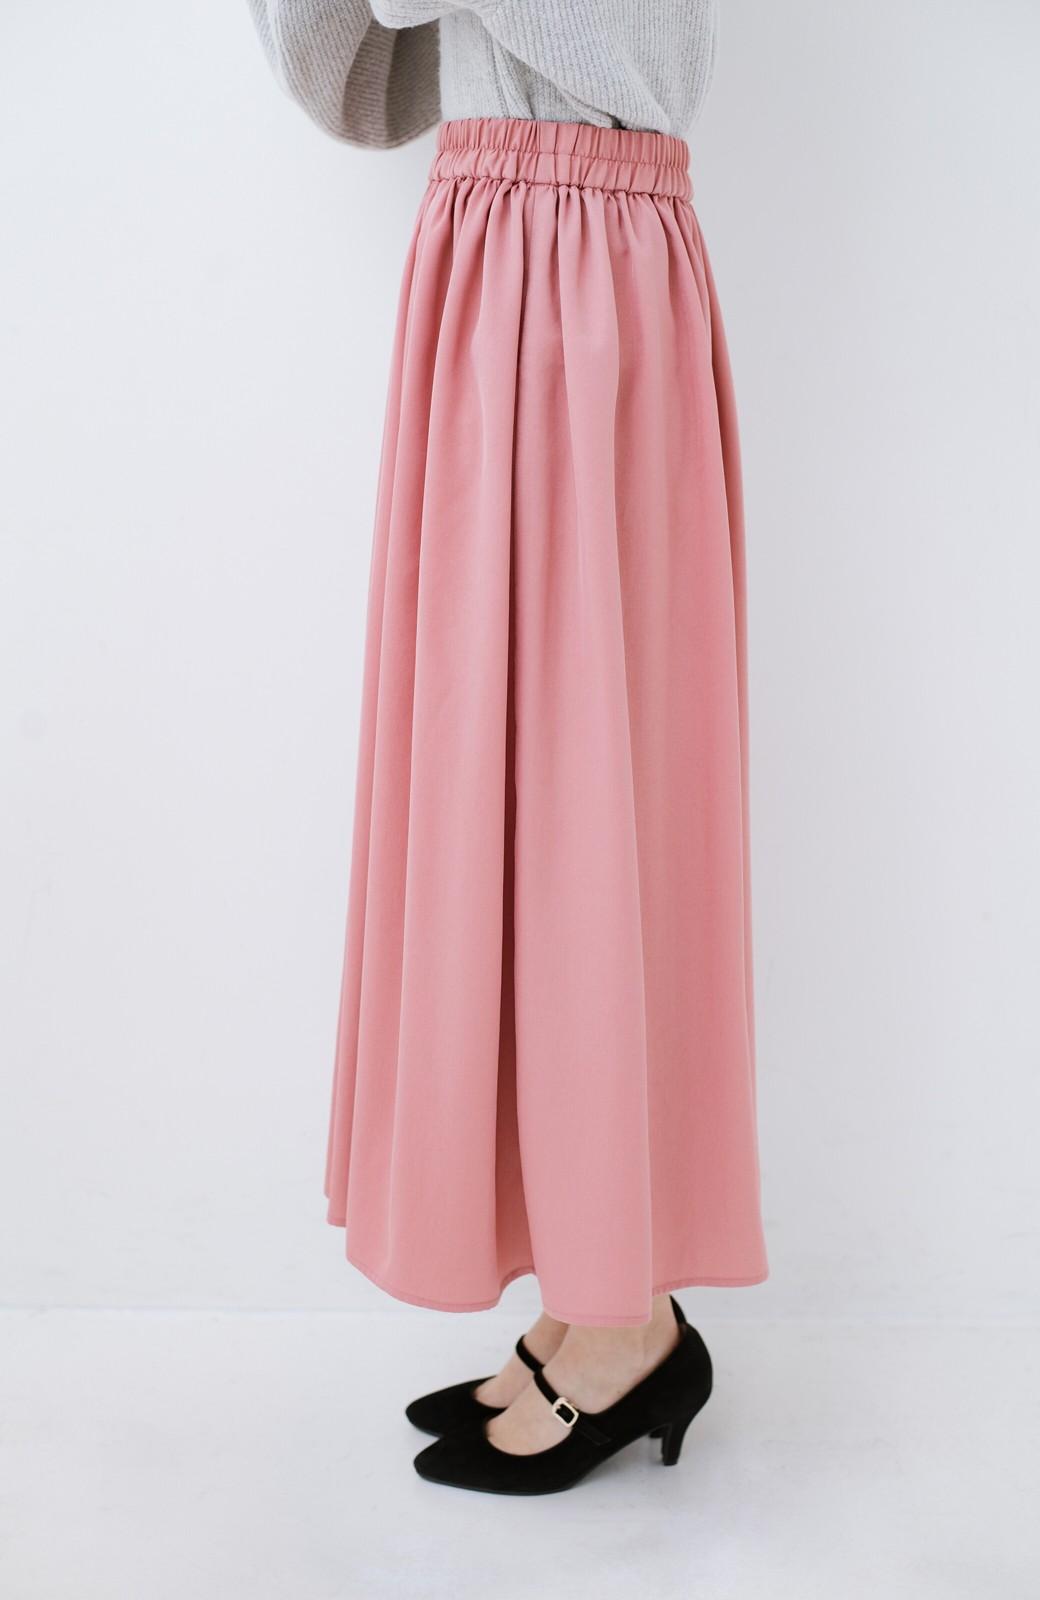 haco! きれいなお姉さんになれる気がするミモレ丈フレアースカート <ピンク>の商品写真5